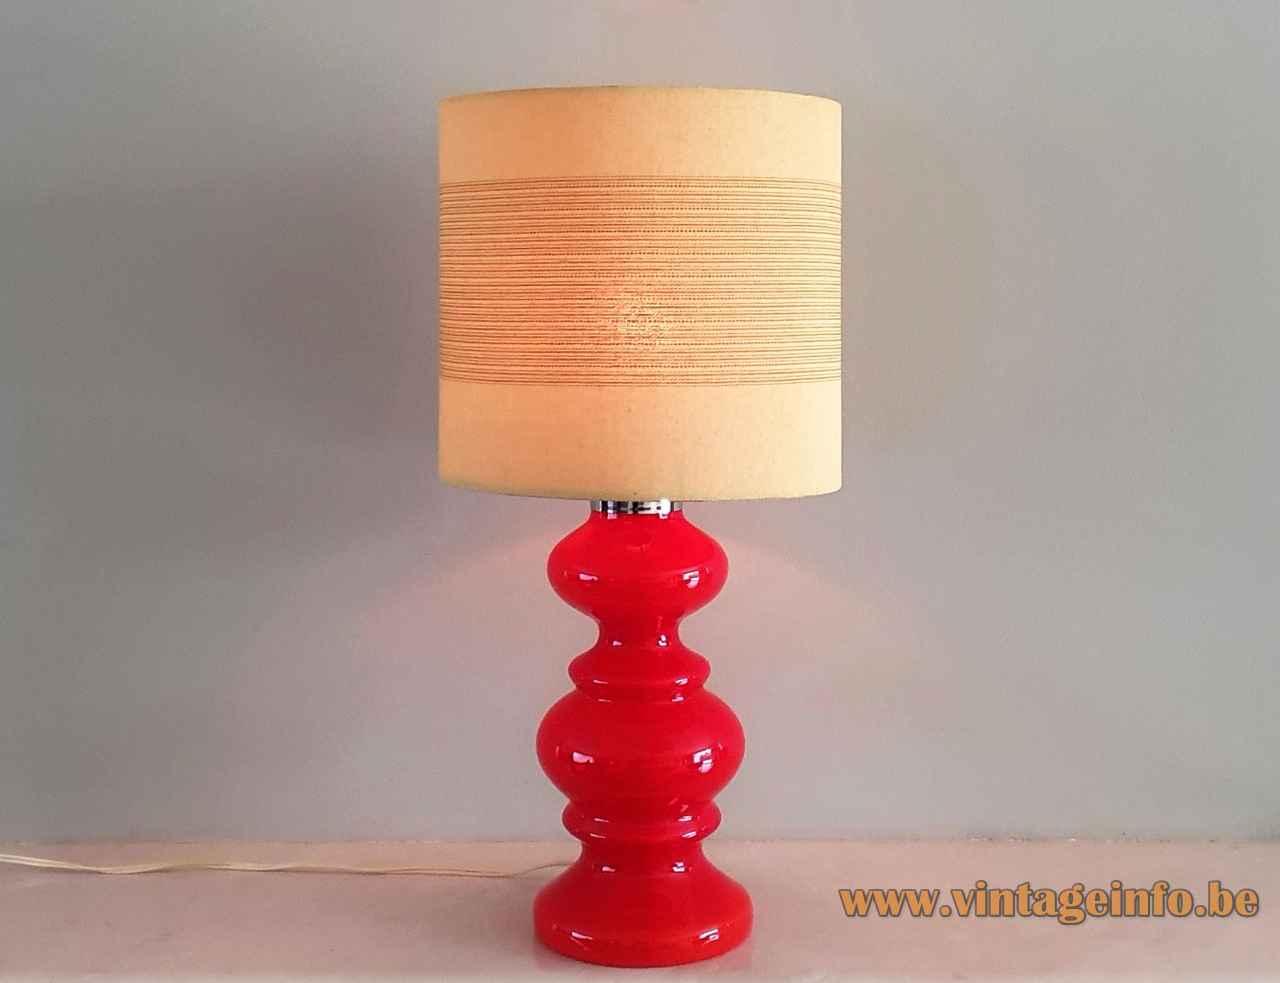 1970s red glass table lamp round tubular fabric lampshade Massive De Rupel Belgium hand blown